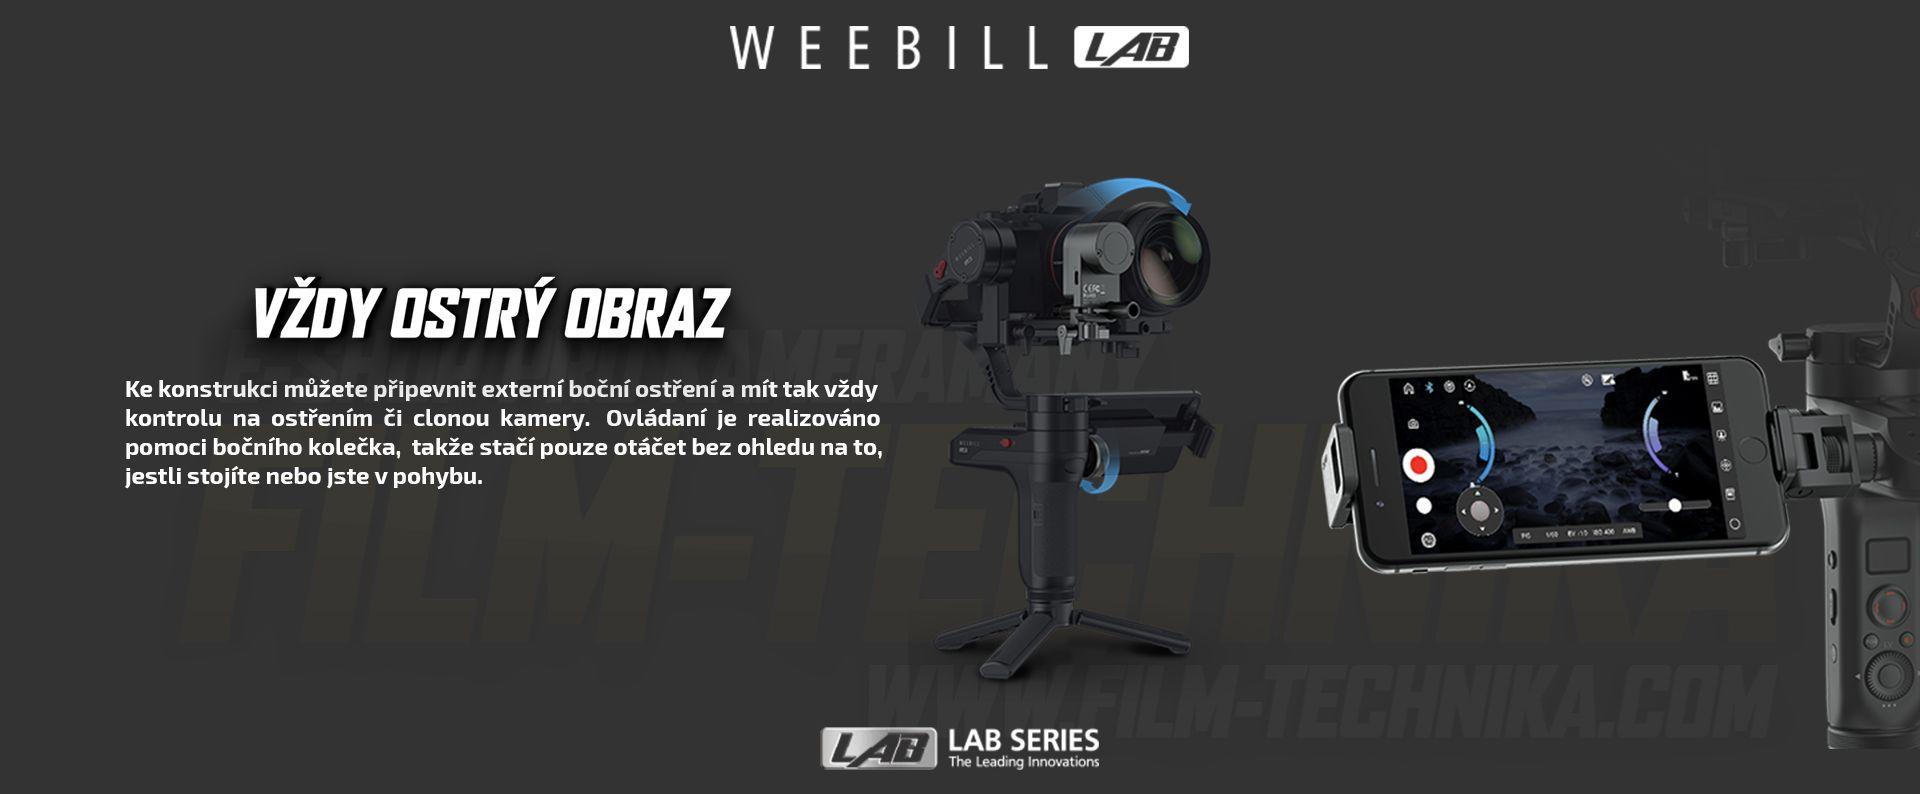 film-technika-zhiyun-weebill-lab-intext11a